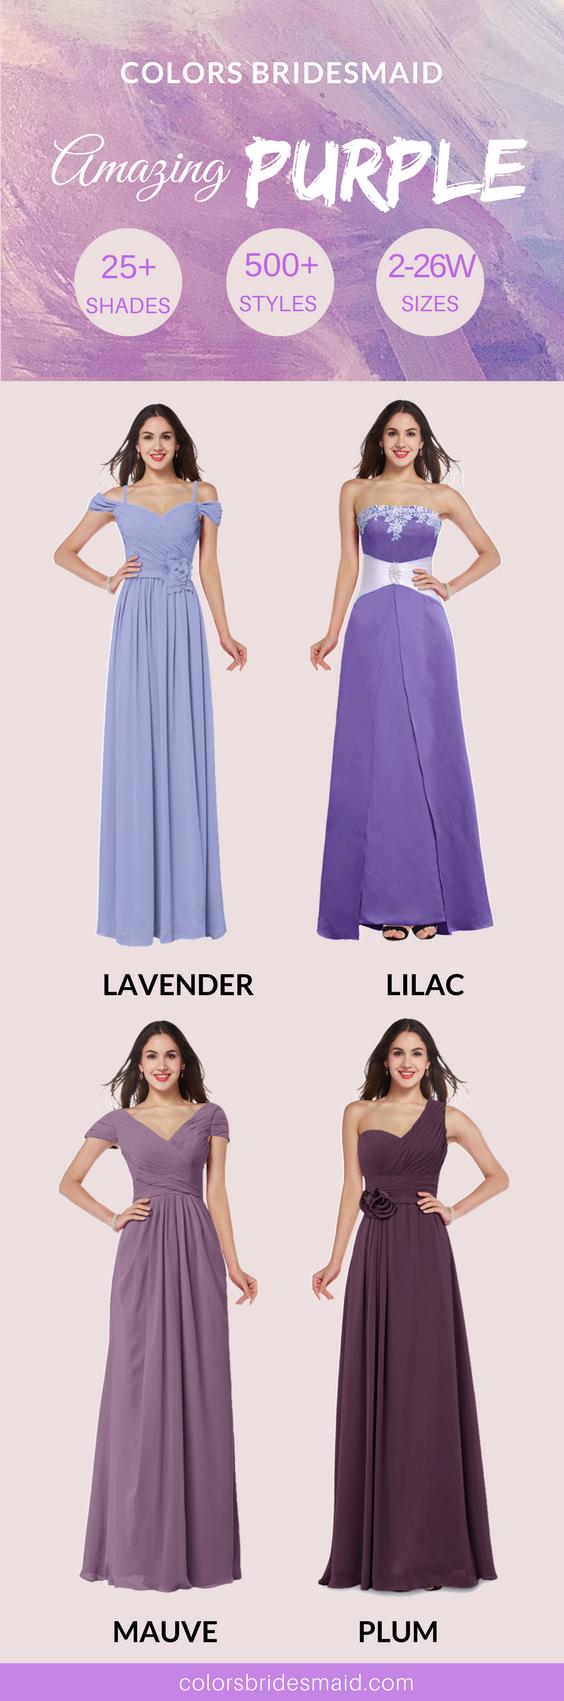 Contemporáneo Bridesmaid Dresses Portsmouth Regalo - Ideas de ...